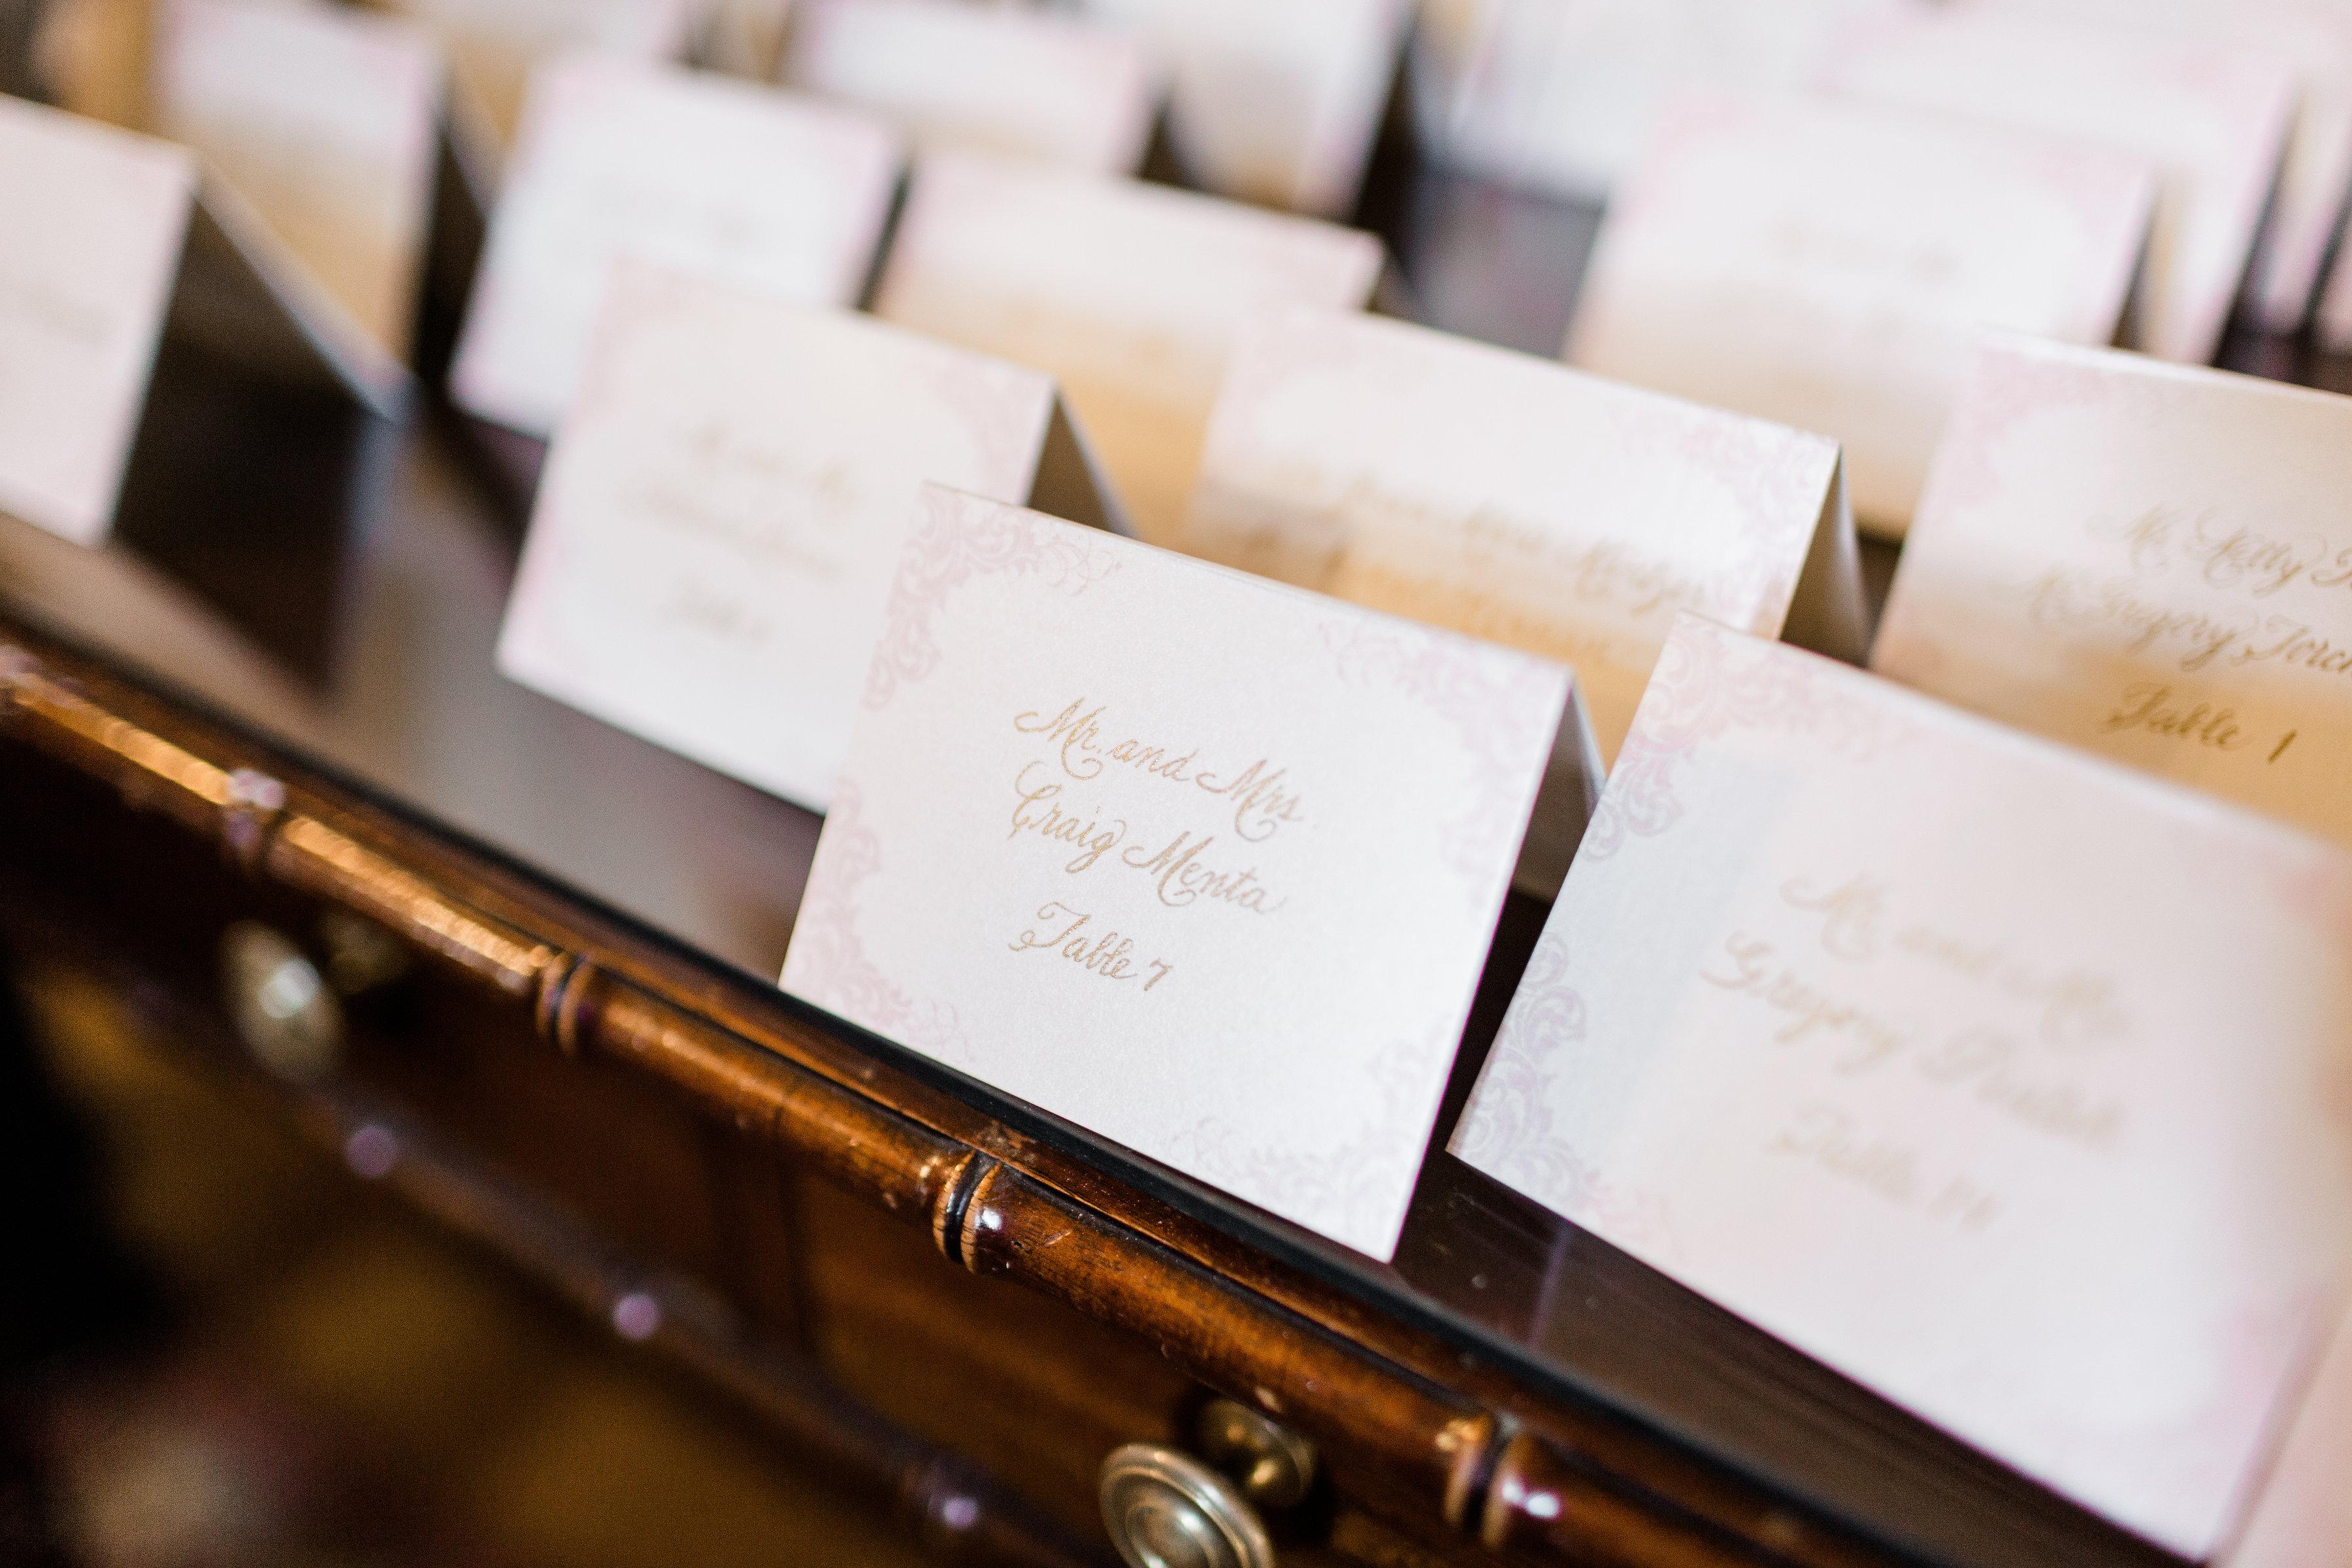 lauren_fair_photography_april_lynn_designs_stasia_matt_spring_cairnwood_estate_wedding_northeast_philadelphia_blush_pink_gold_wedding_invitation_stationery_0148